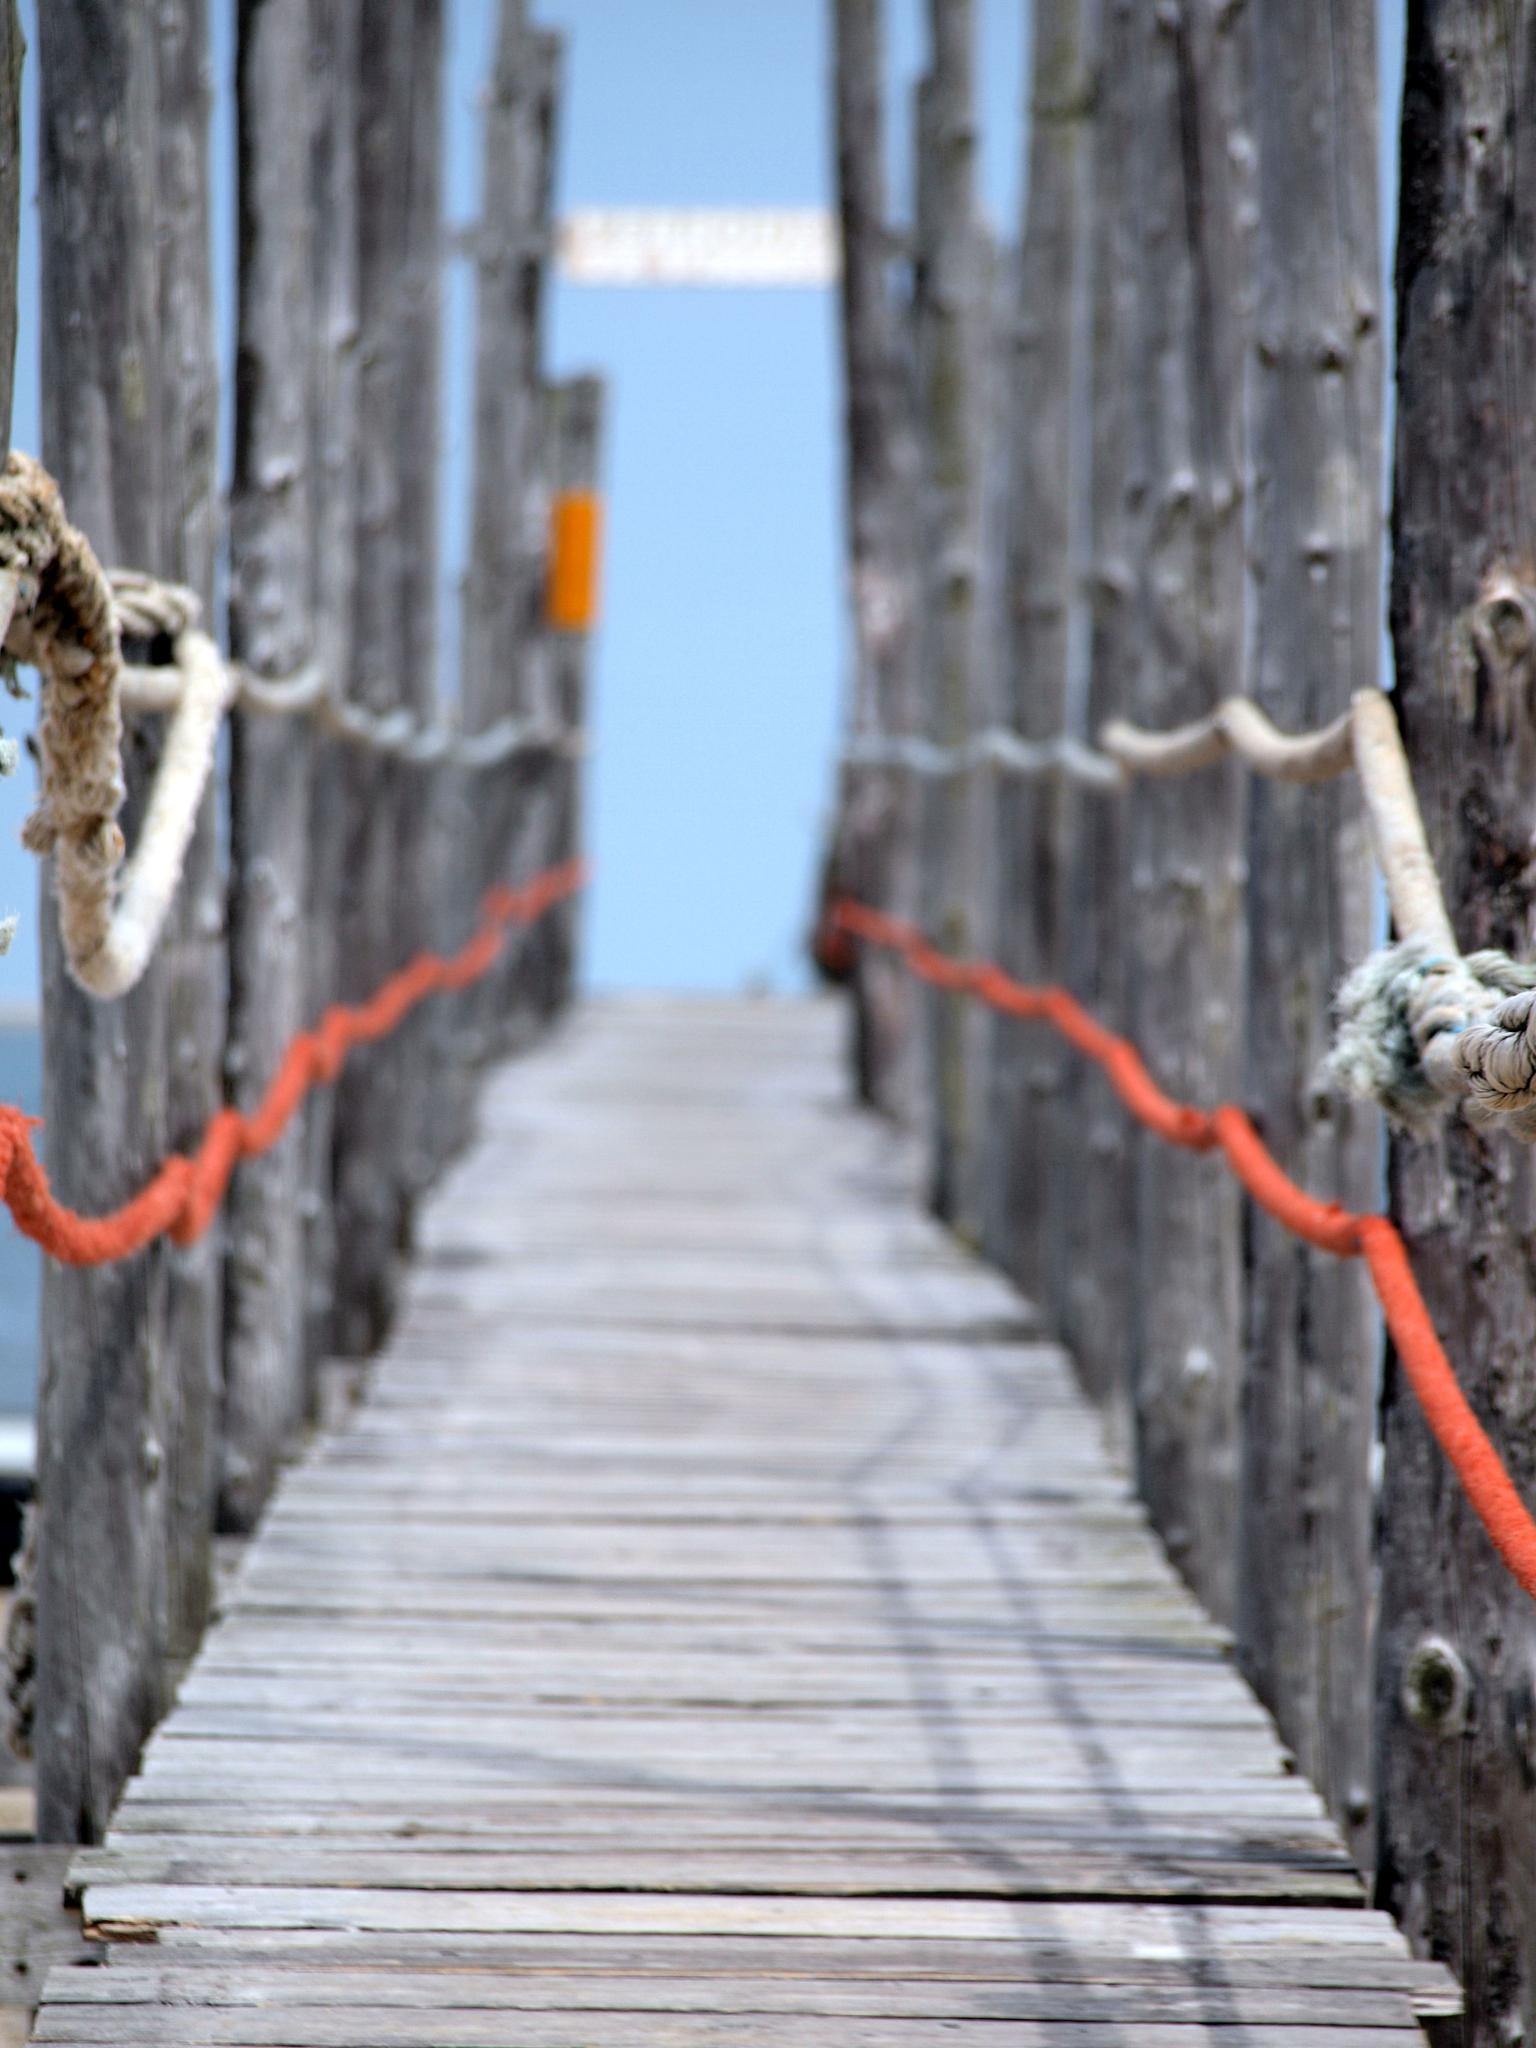 The Pier by Kristof Z.